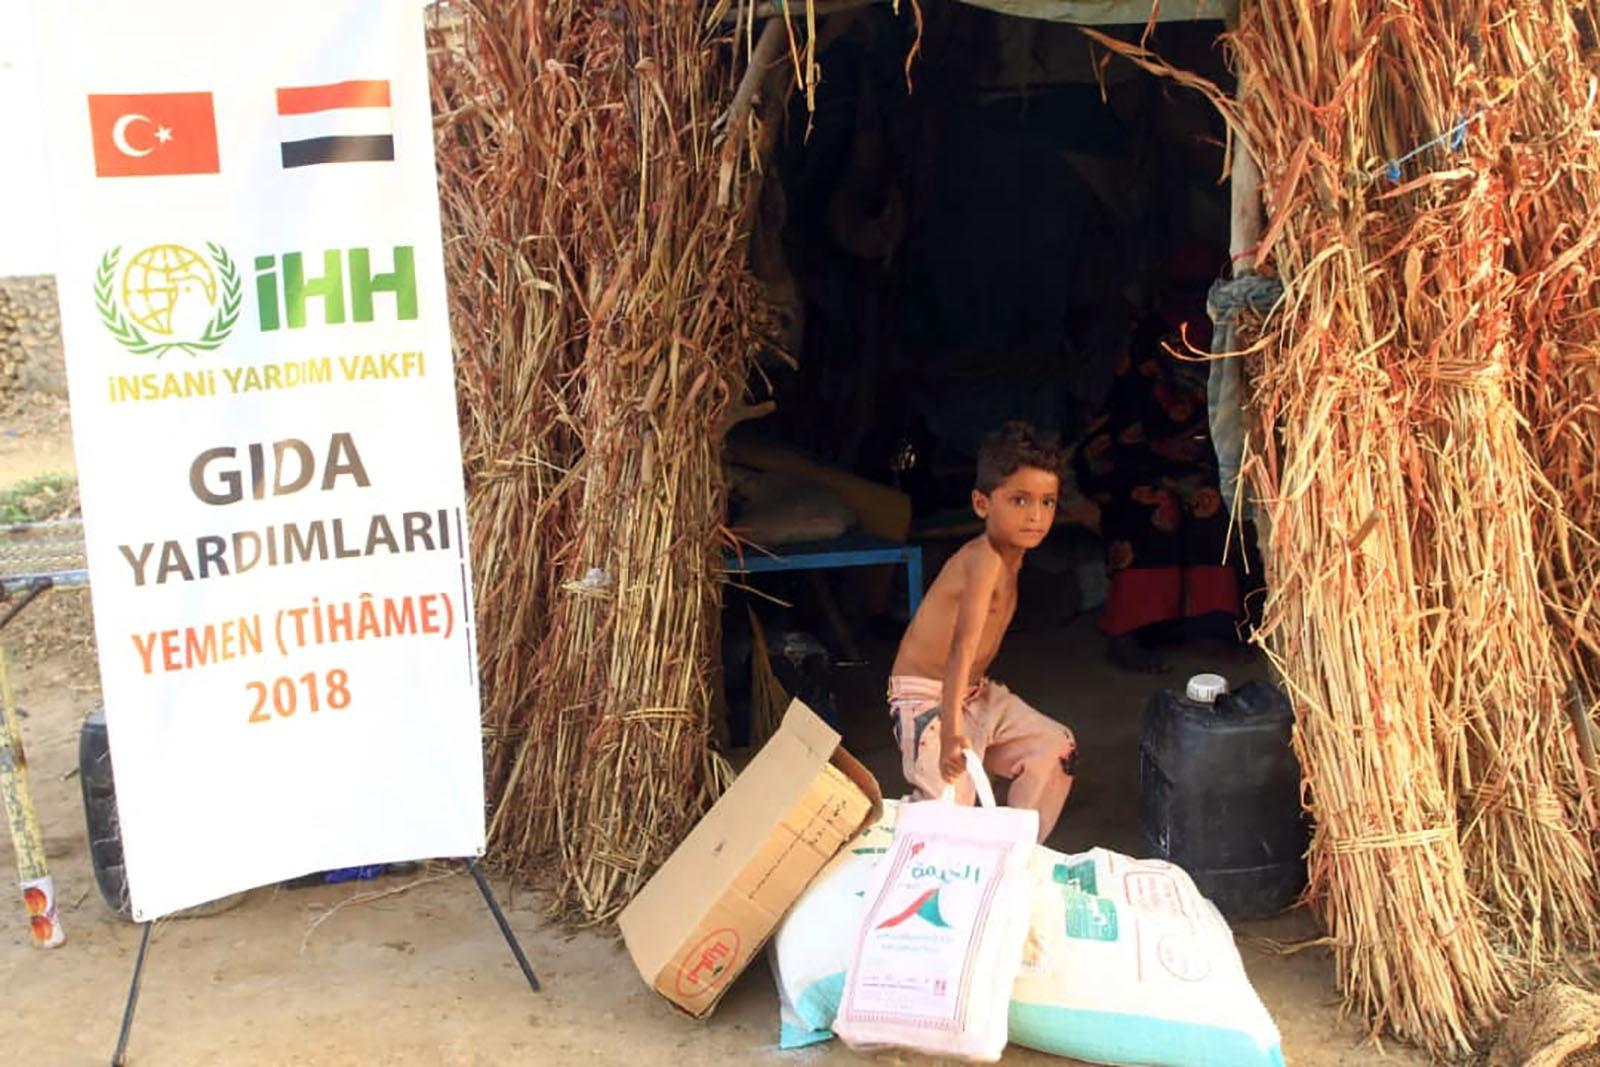 ihh-yemen-acil-yardim-kampanyasi-3.jpg